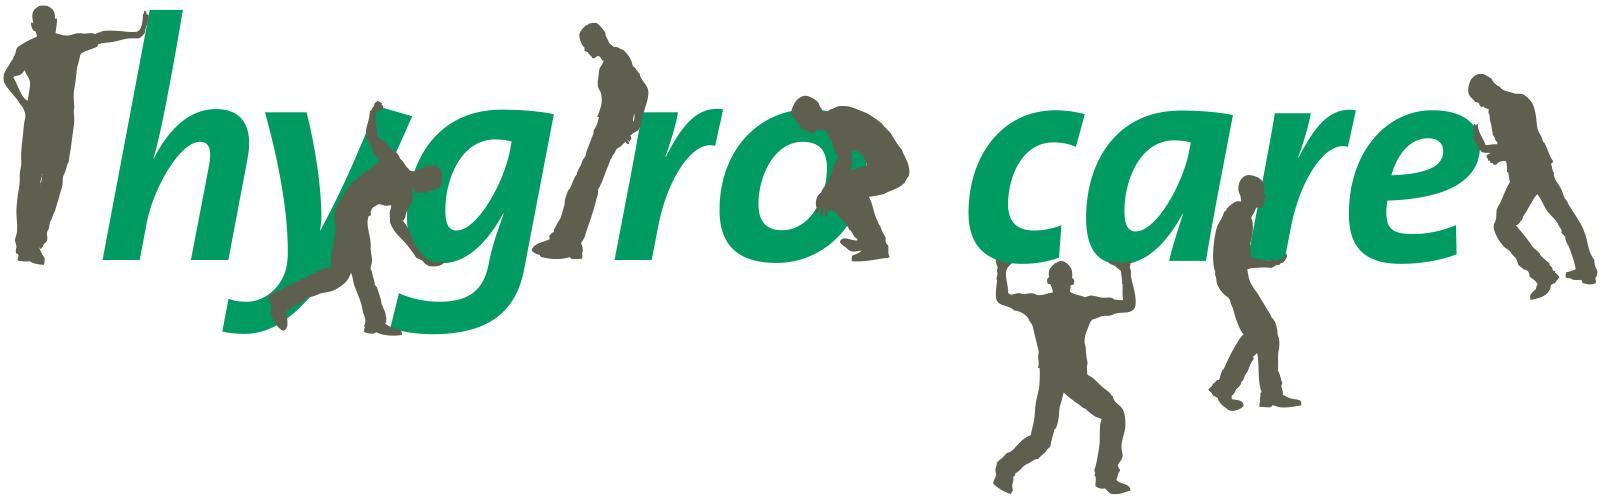 hygro-care-team-aufbau